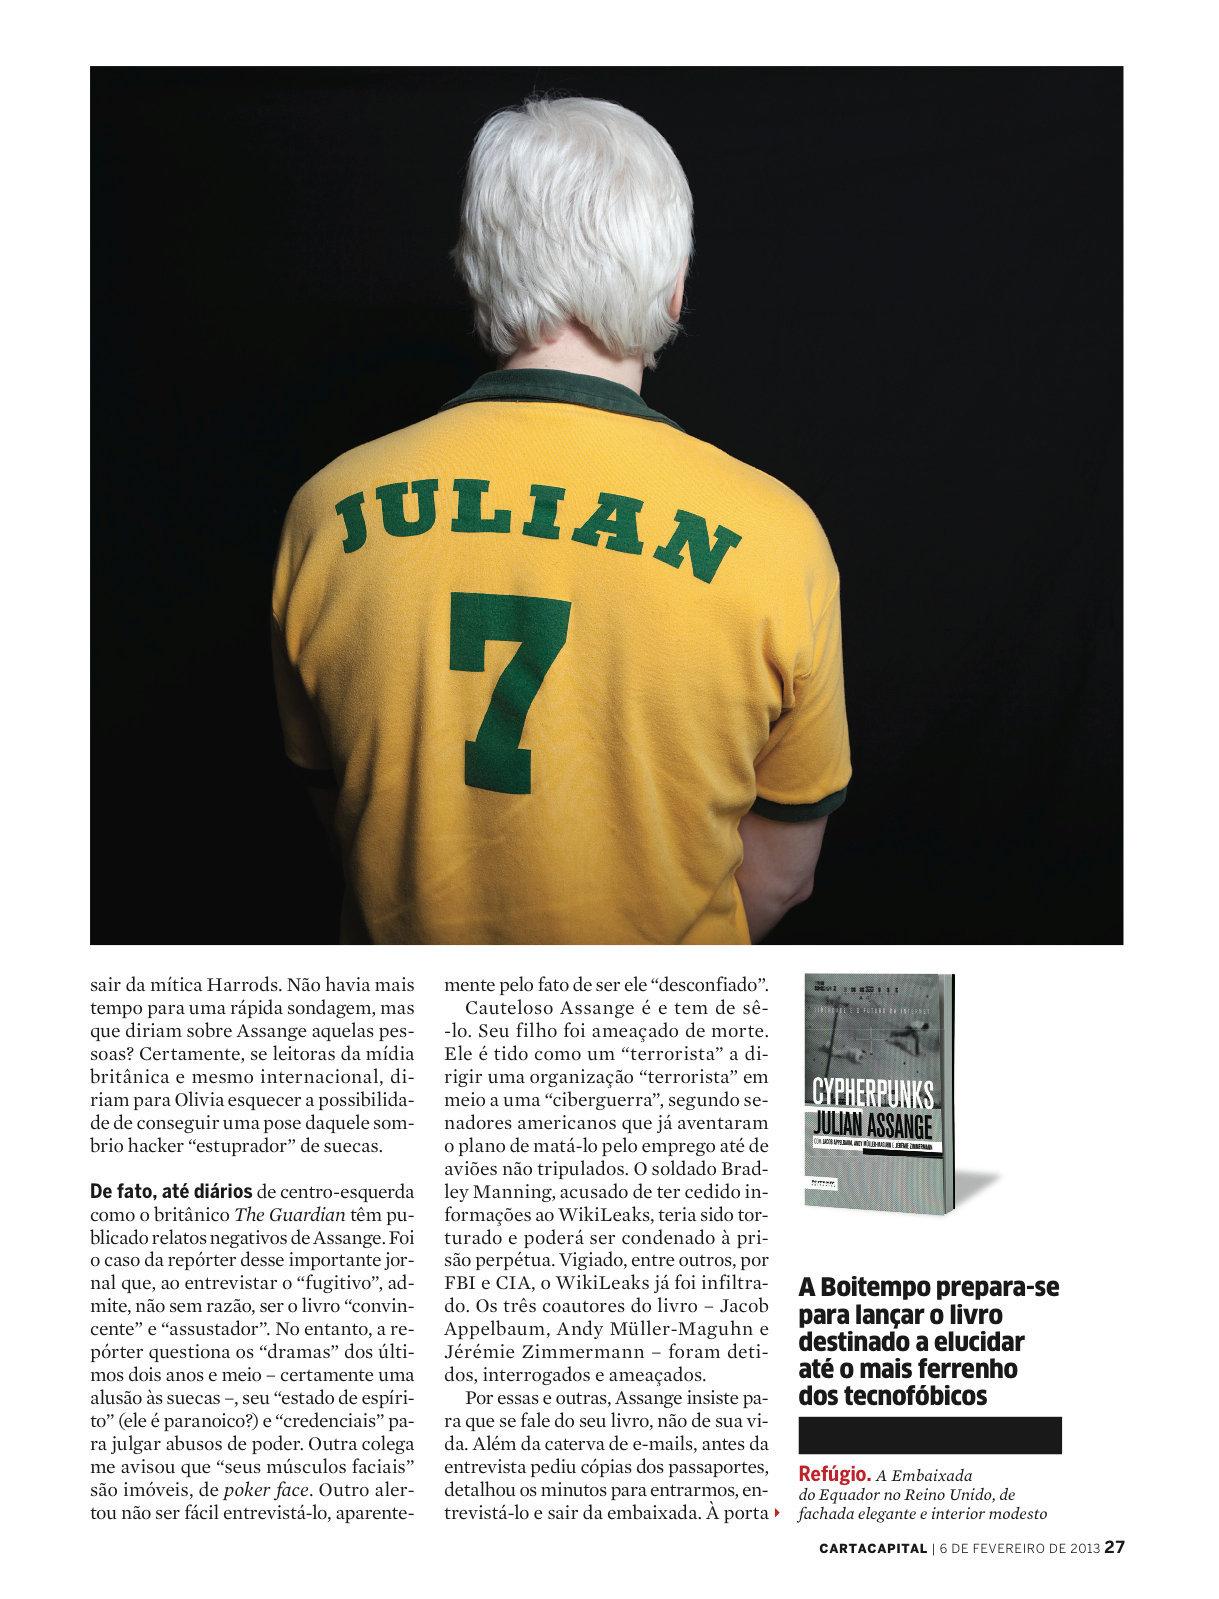 Assange_single page.jpg